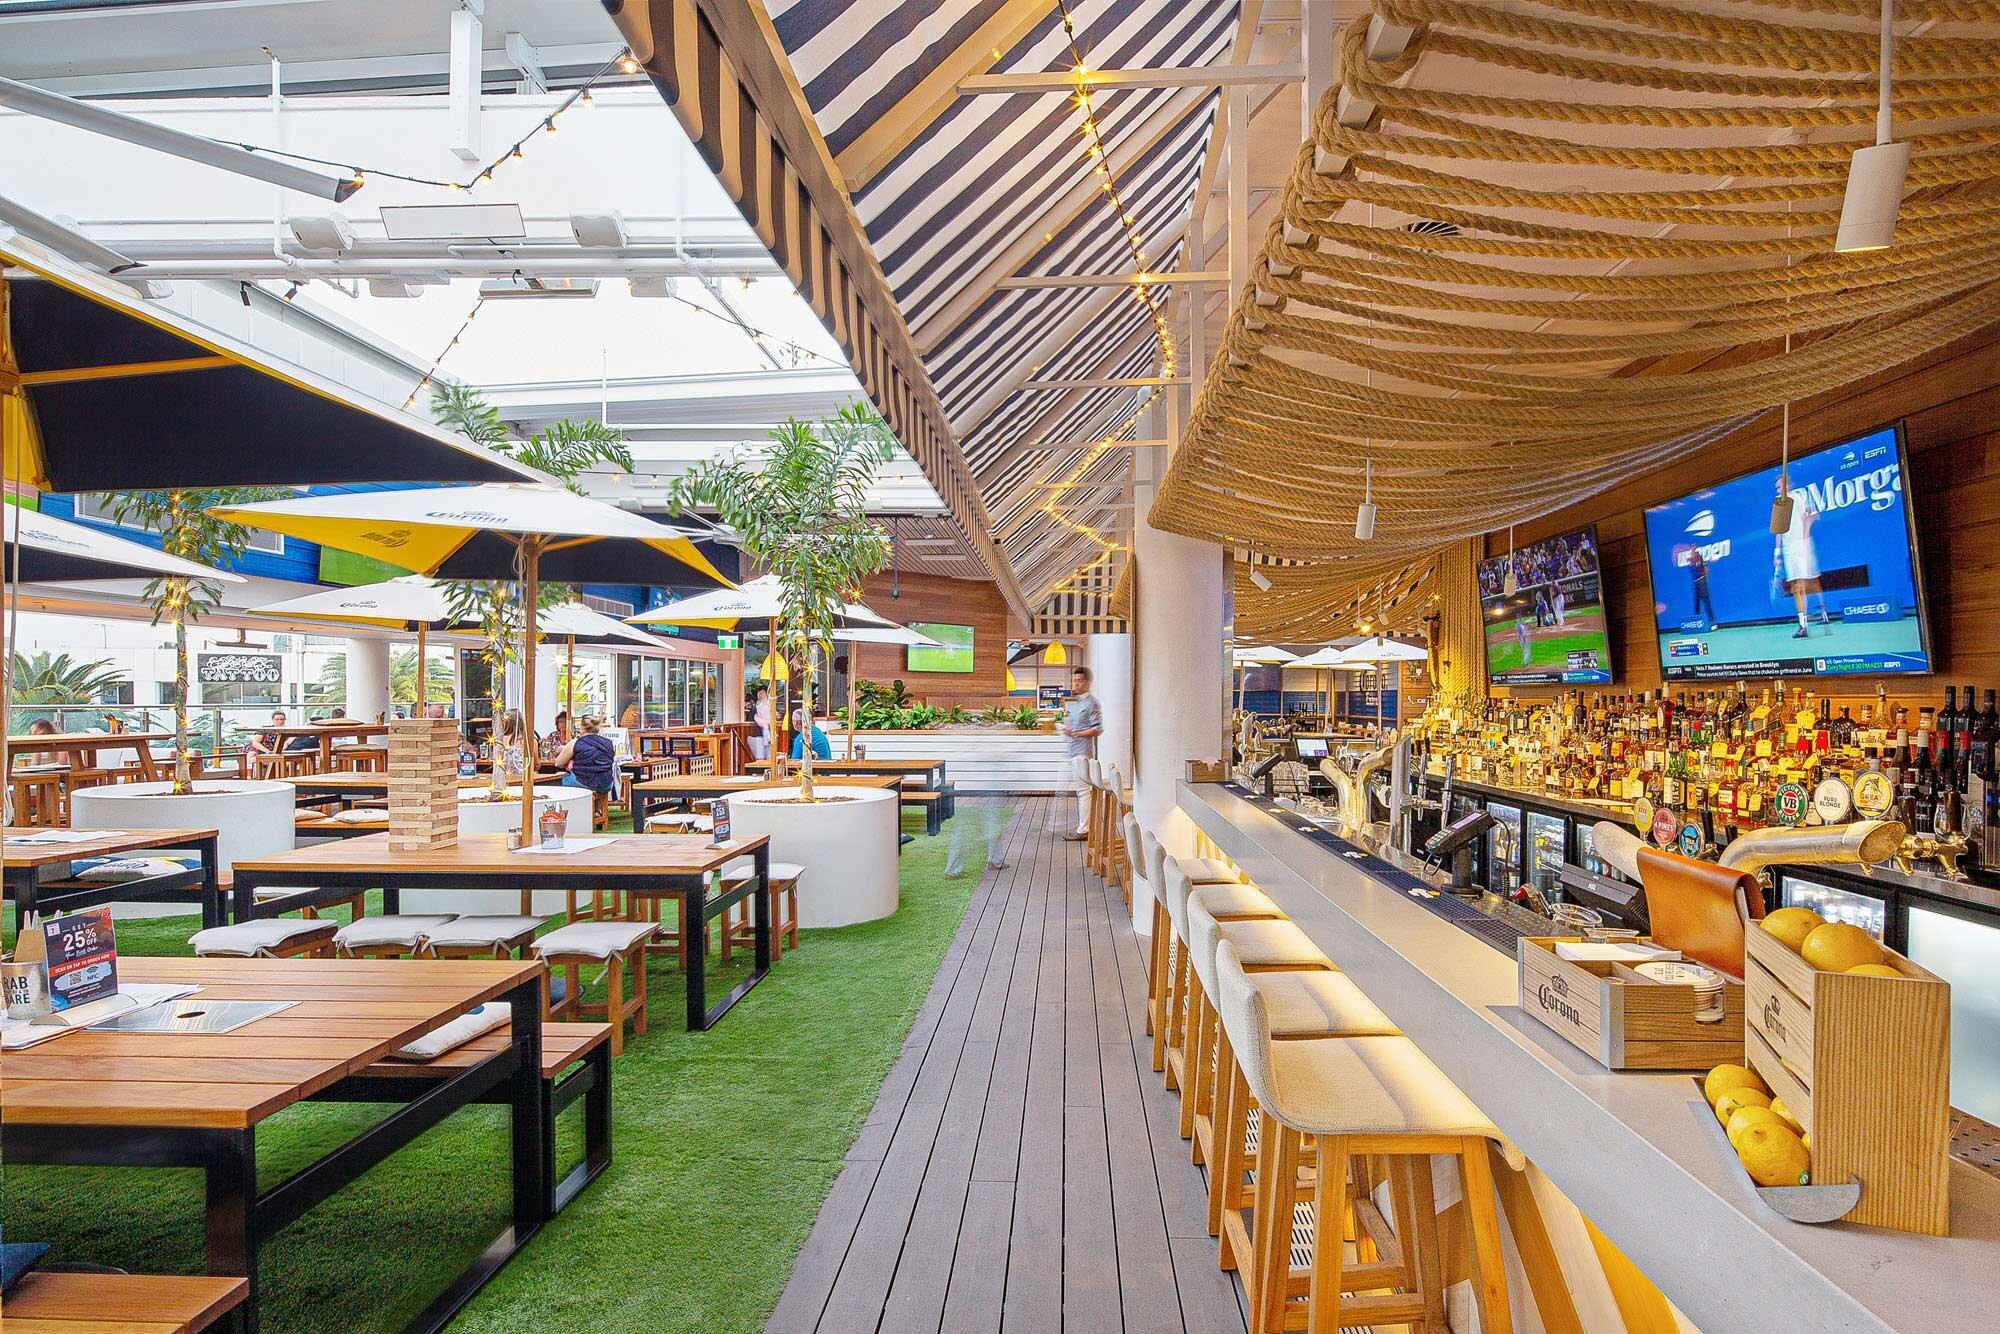 Surfers-Paradise-Beer-Garden-Pub-Architecture-2.jpg